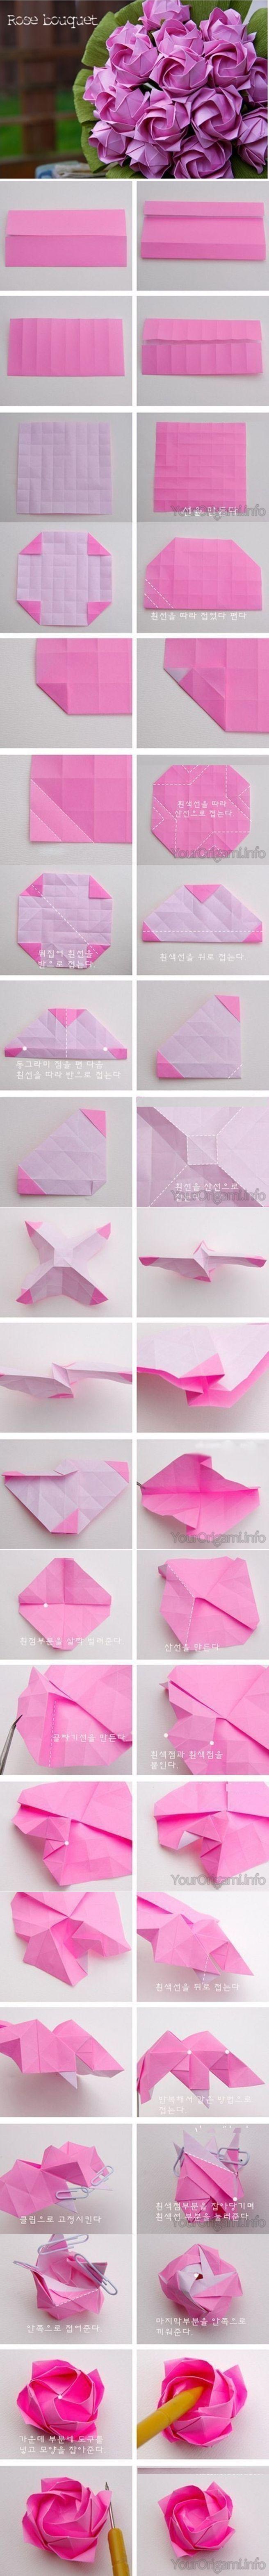 Photo of DIY schöne Origami Papier Rose Bouquet – DIY Papier Blog – Playdoh